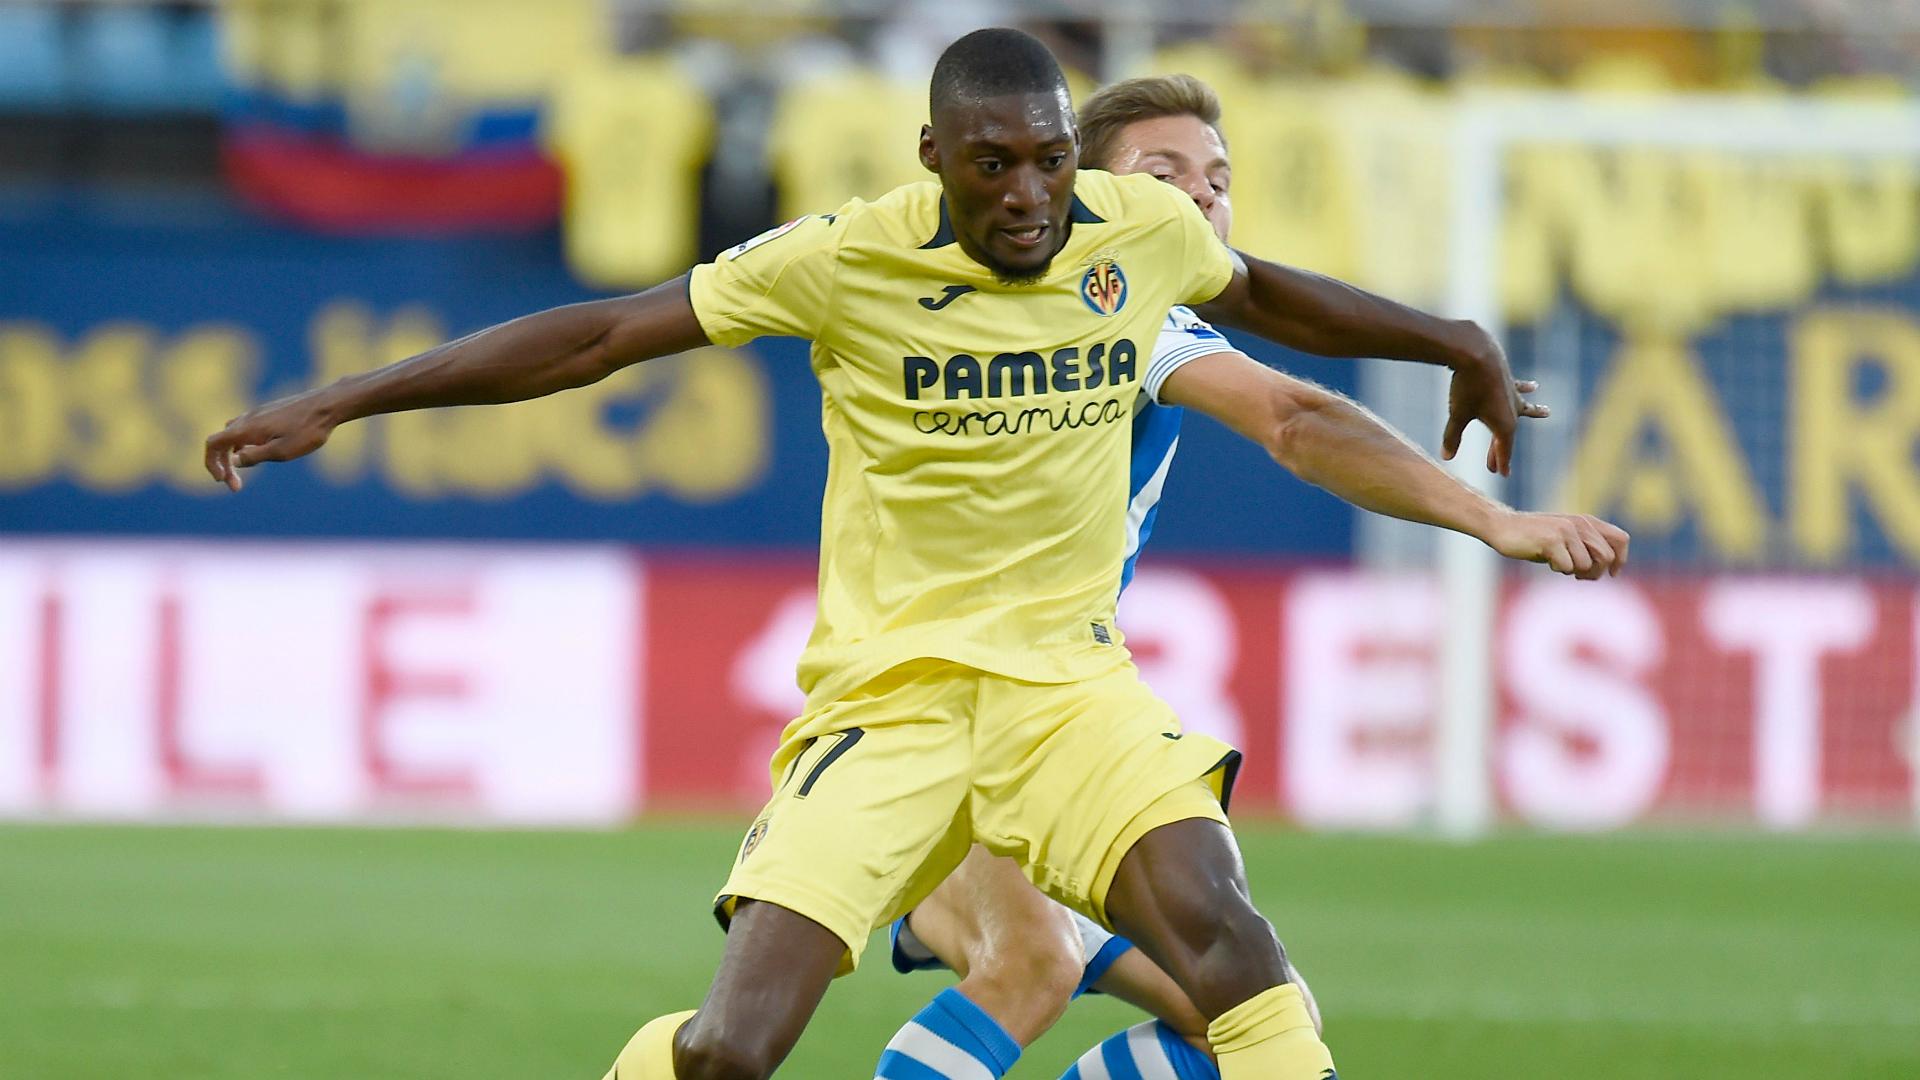 Toko Ekambi equals Mariano's Lyon record after goalscoring debut against Toulouse